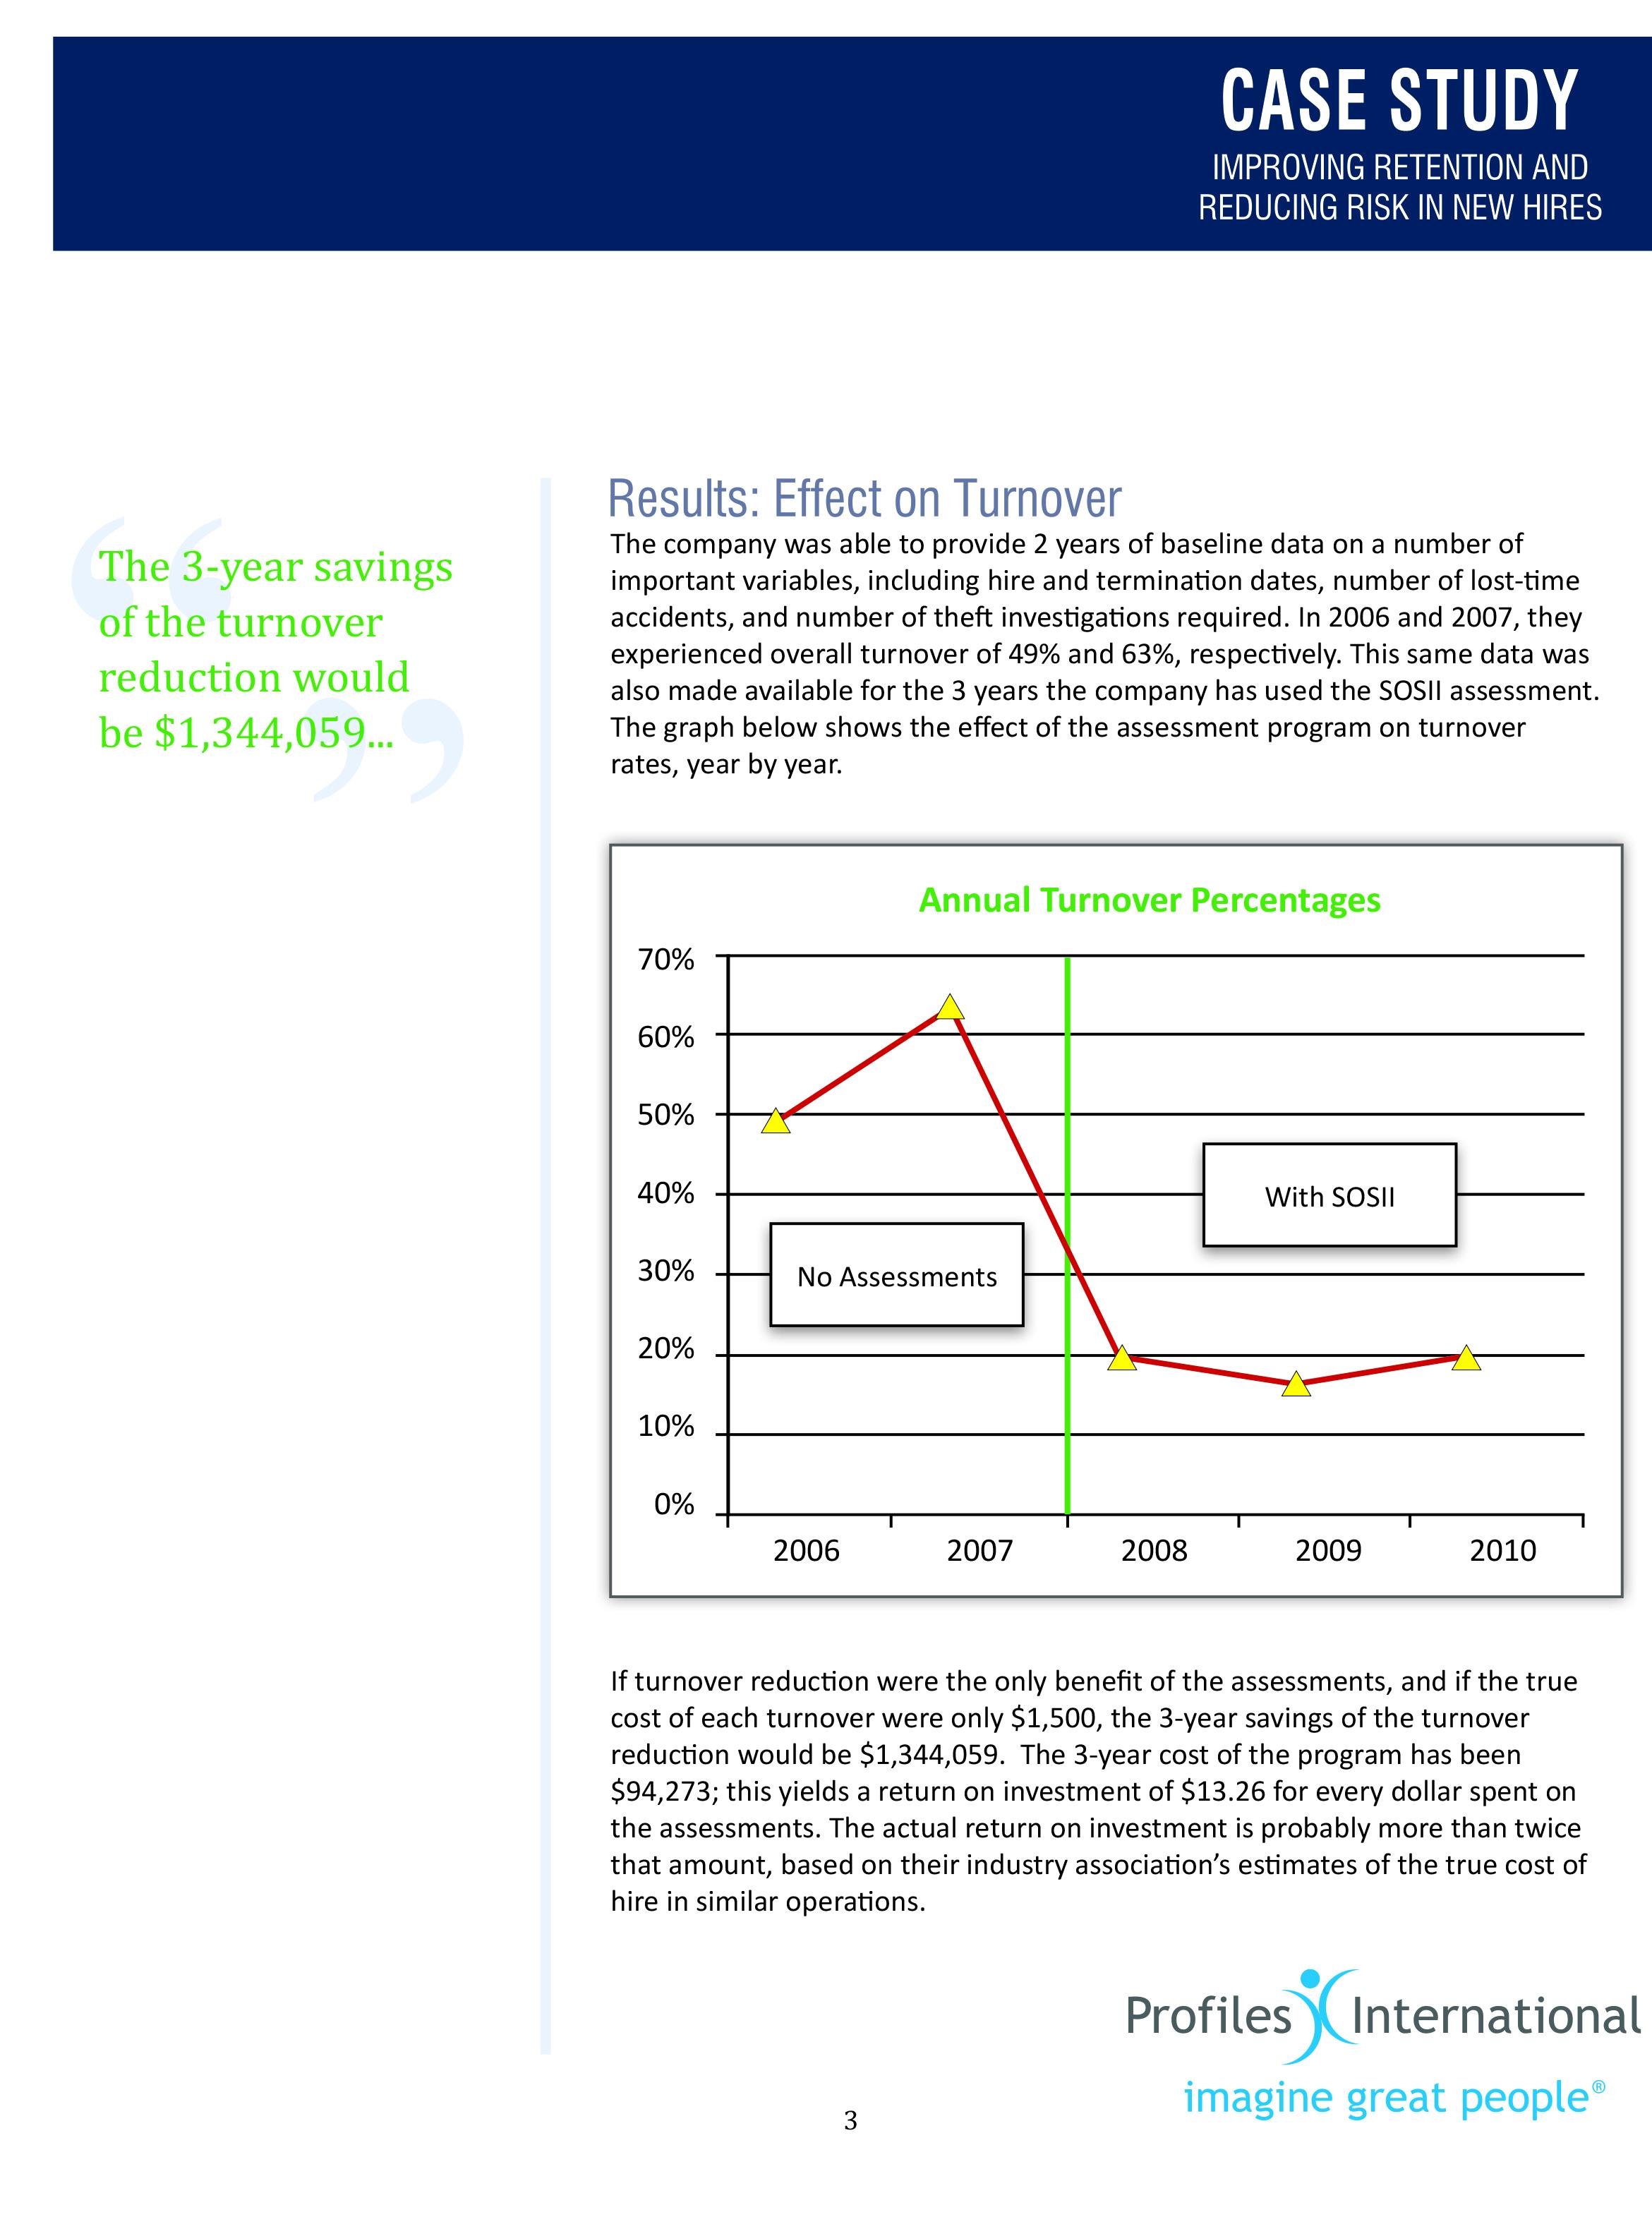 CS-Call Center-Strategic Hiring System Pays Off3.jpg